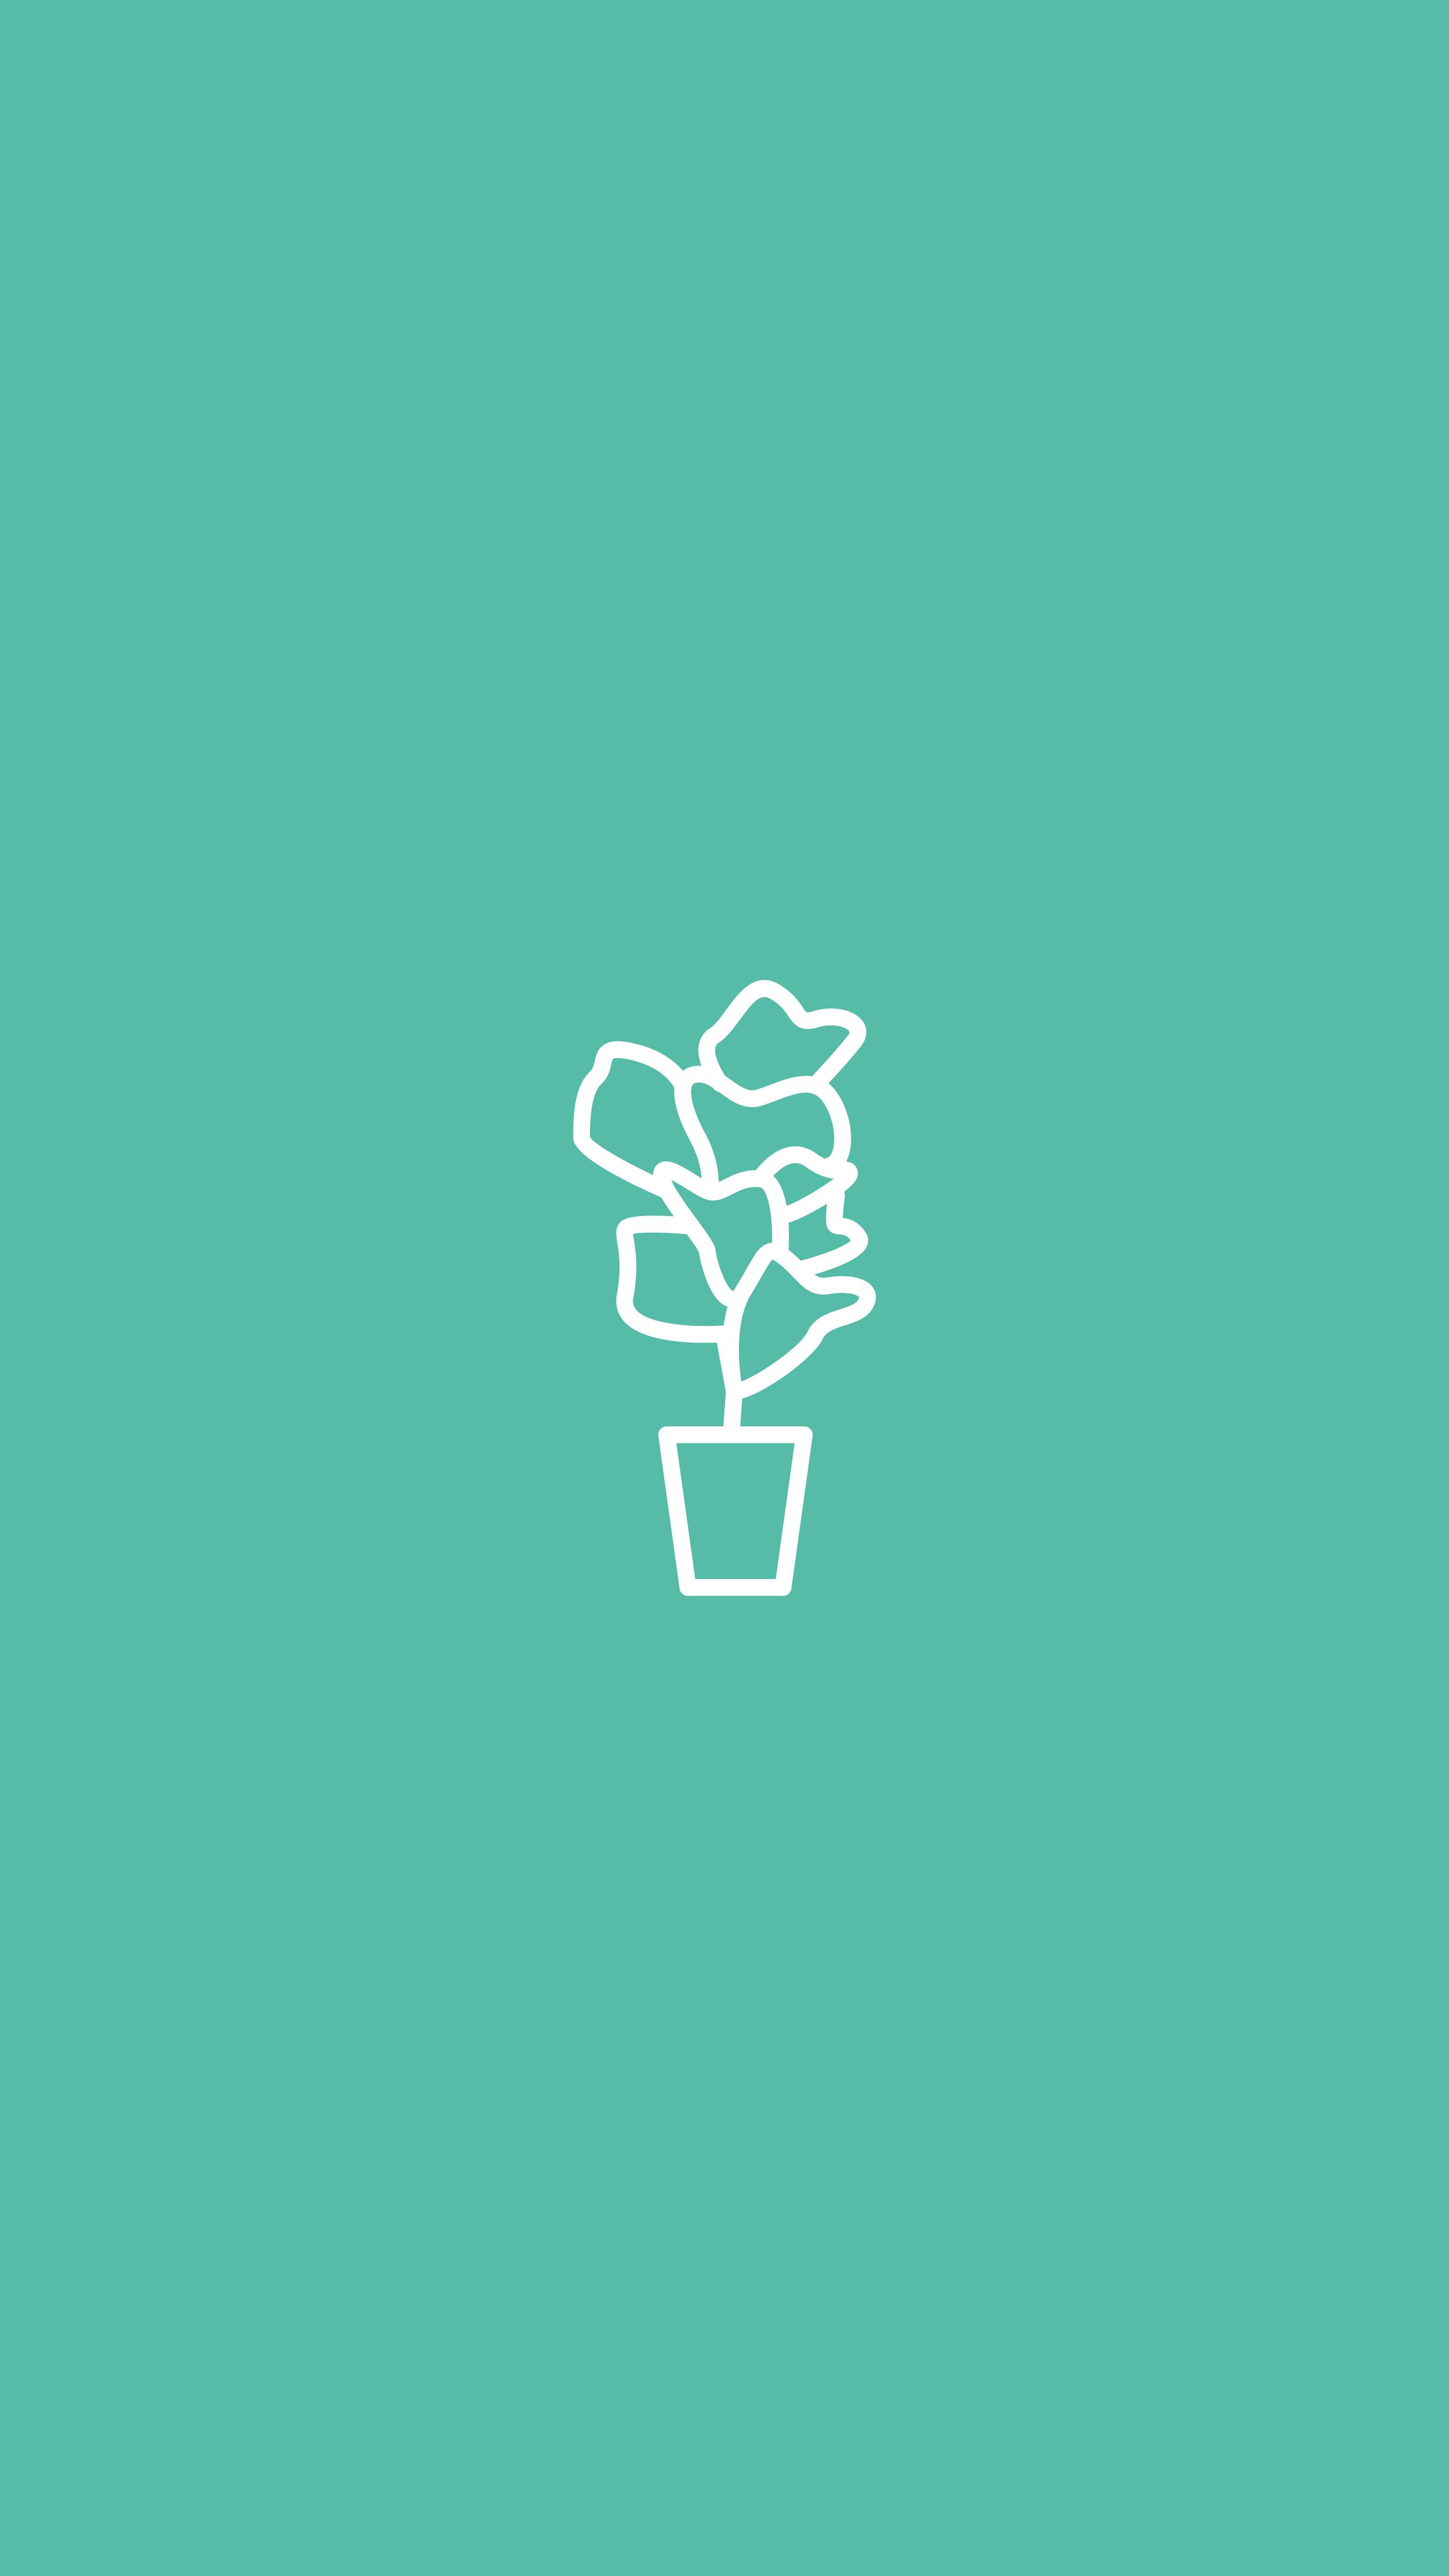 Fiddle Leaf Fig, Plants, House Plant